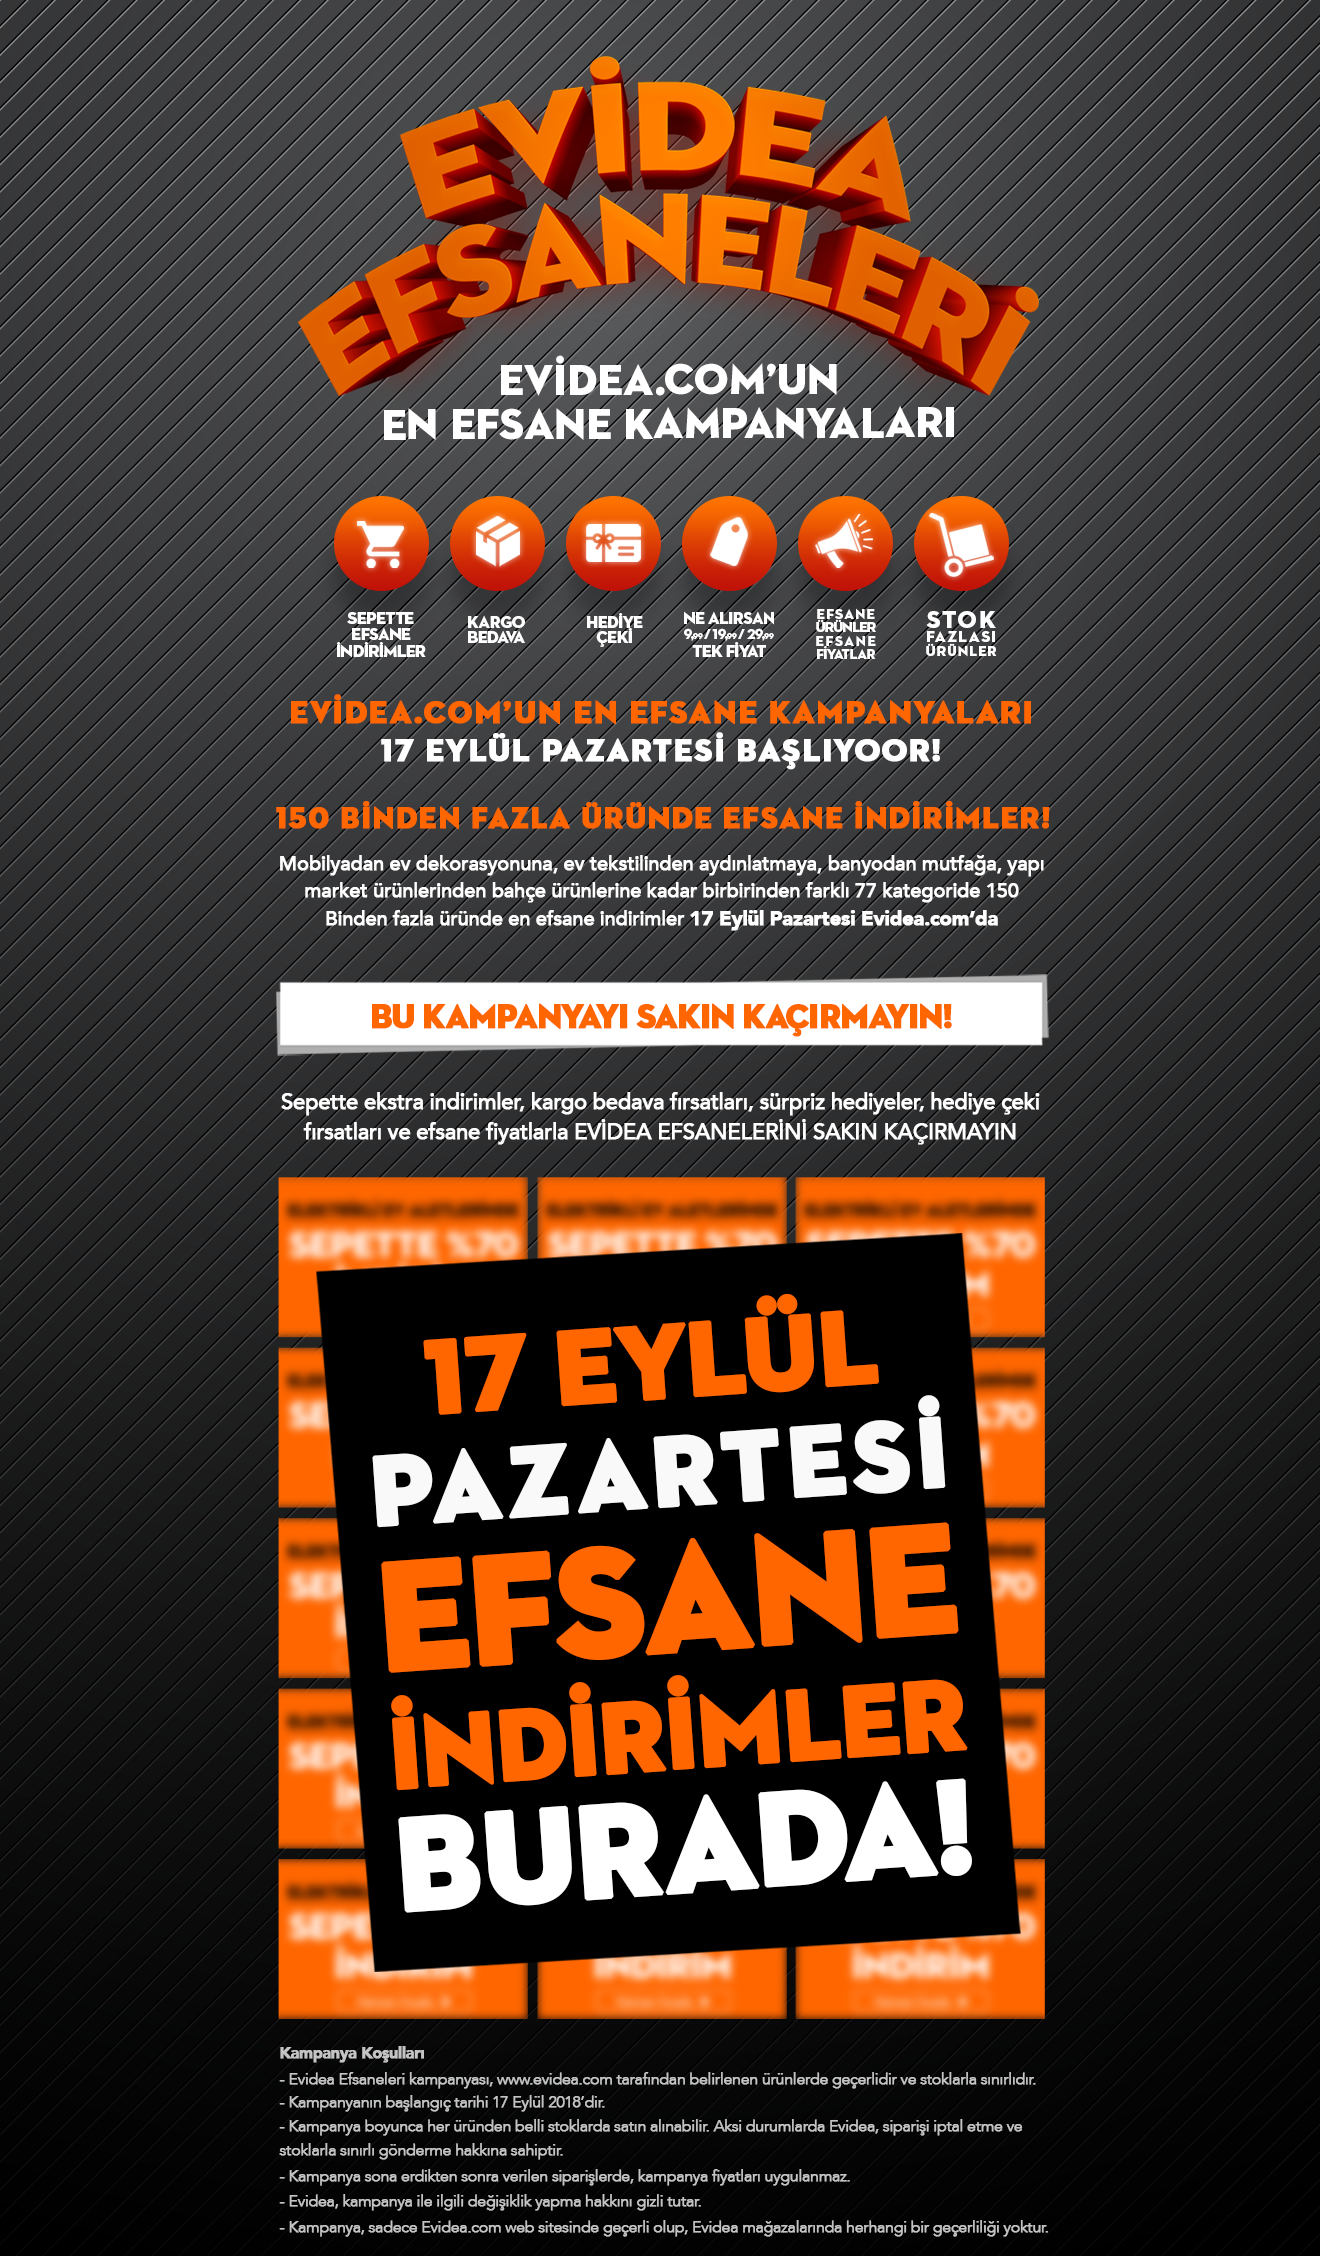 evidea.com Evidea Efsaneleri kampanyası